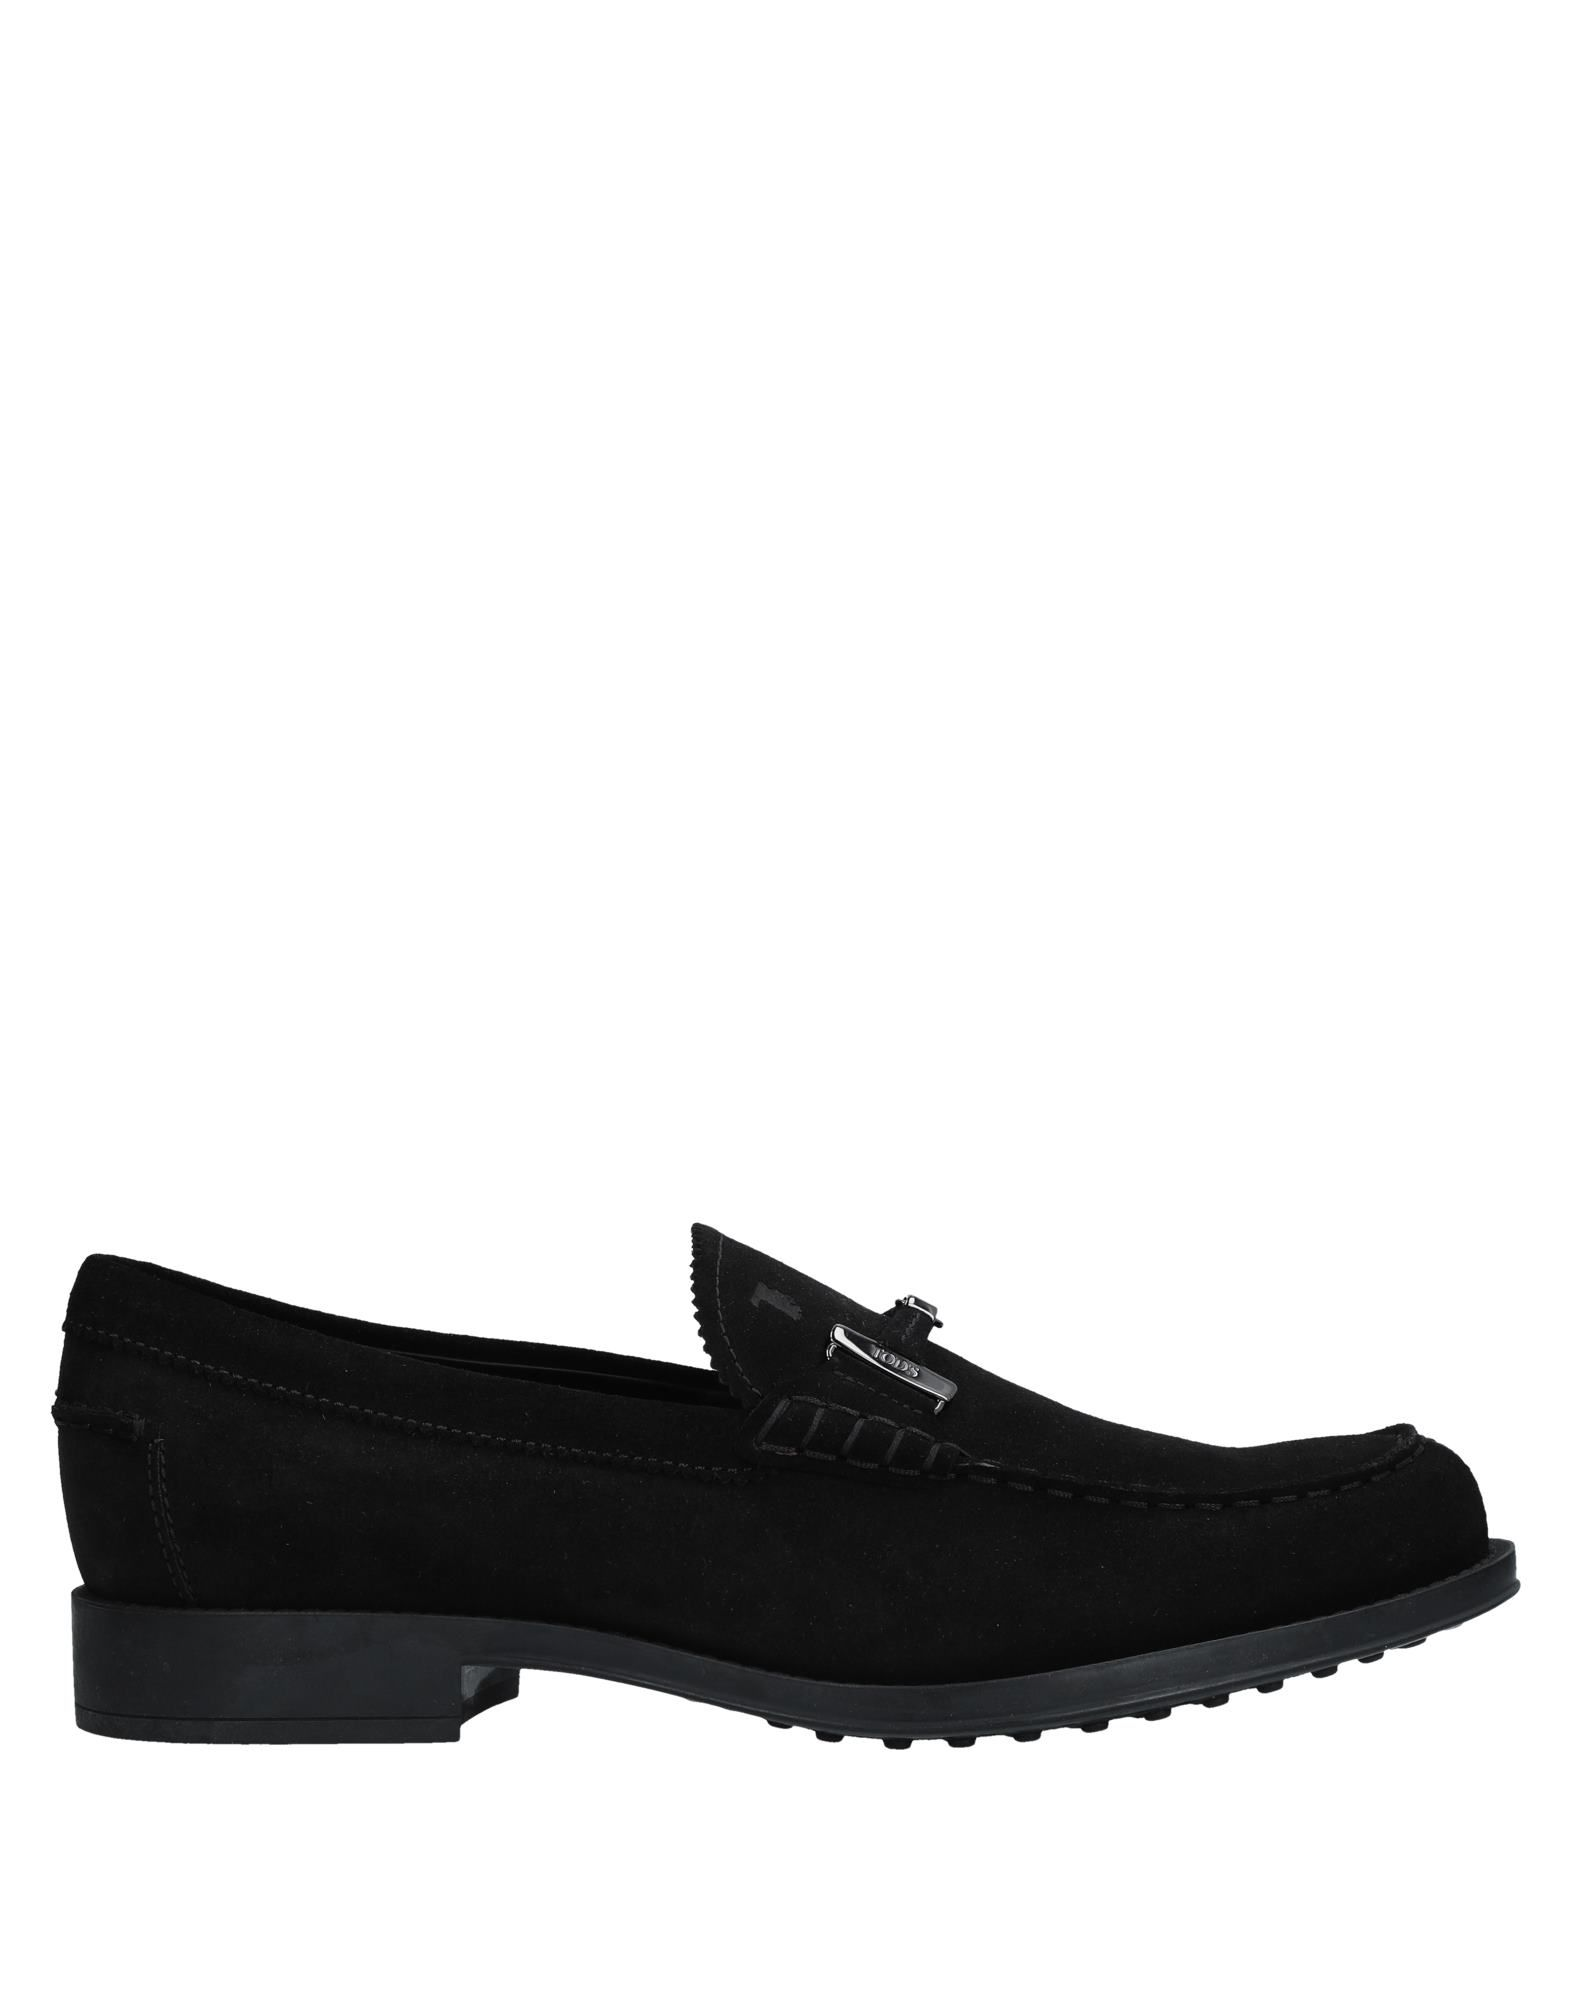 Tod's Mokassins Herren  11541730JB Gute Qualität beliebte Schuhe